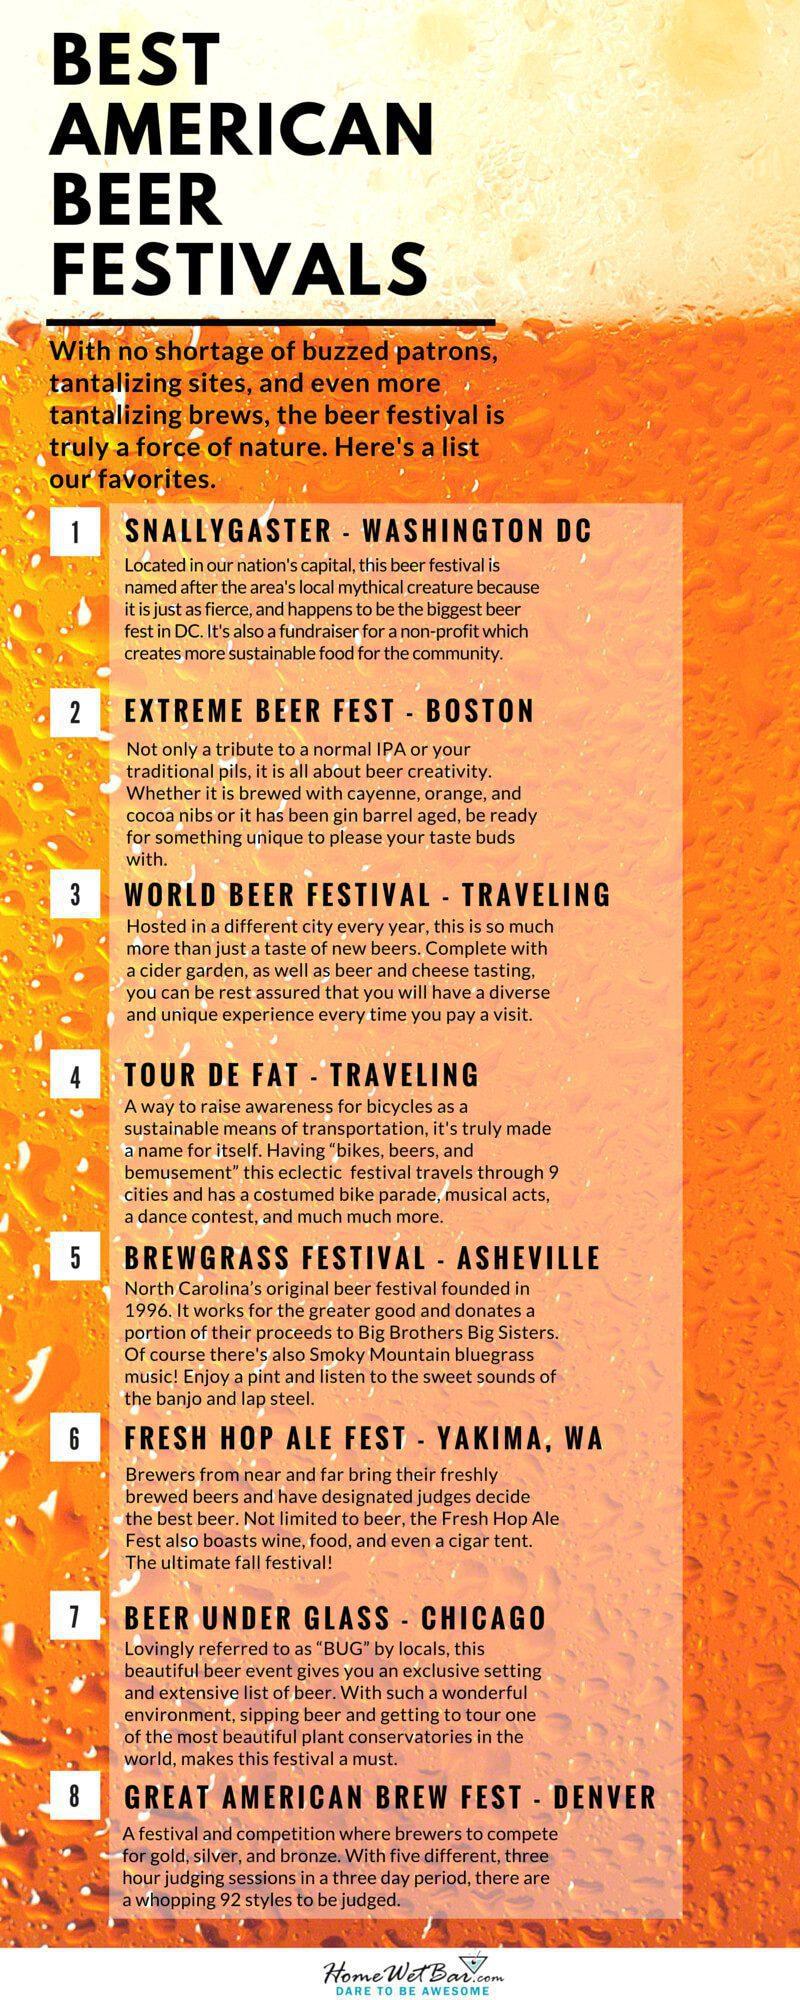 Best American Beer Festivals Infographic